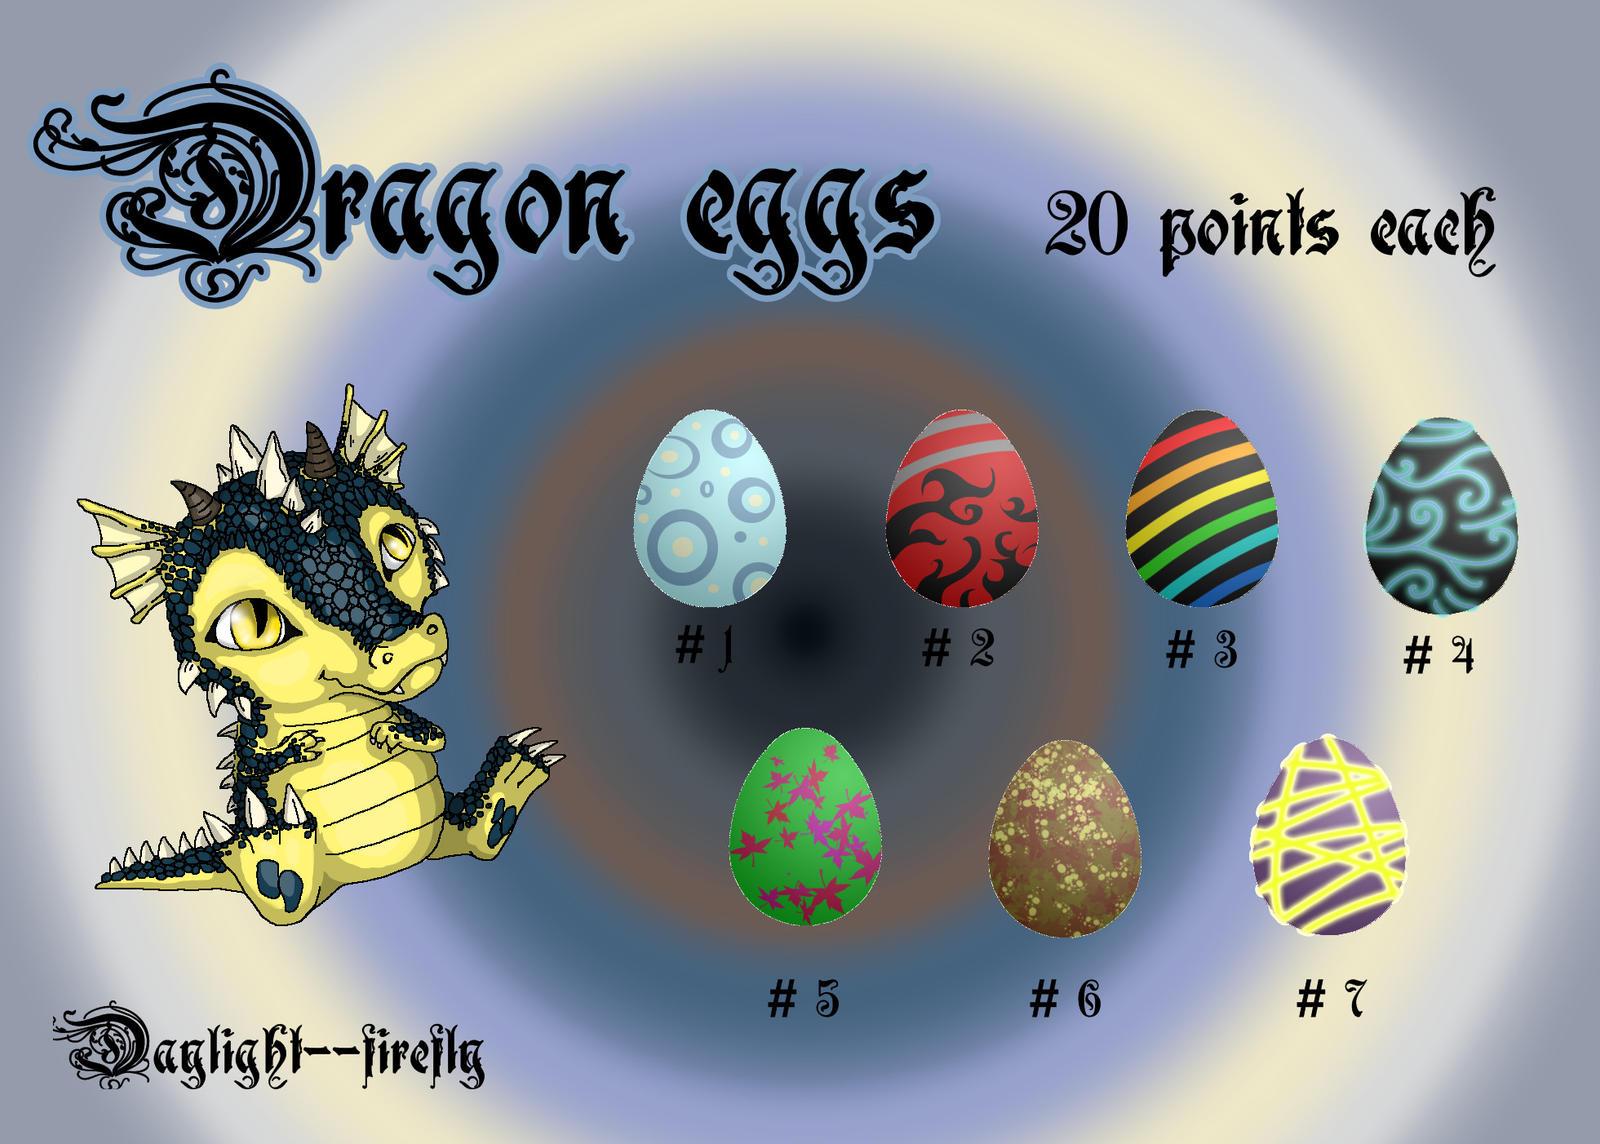 Firefly eggs - photo#20